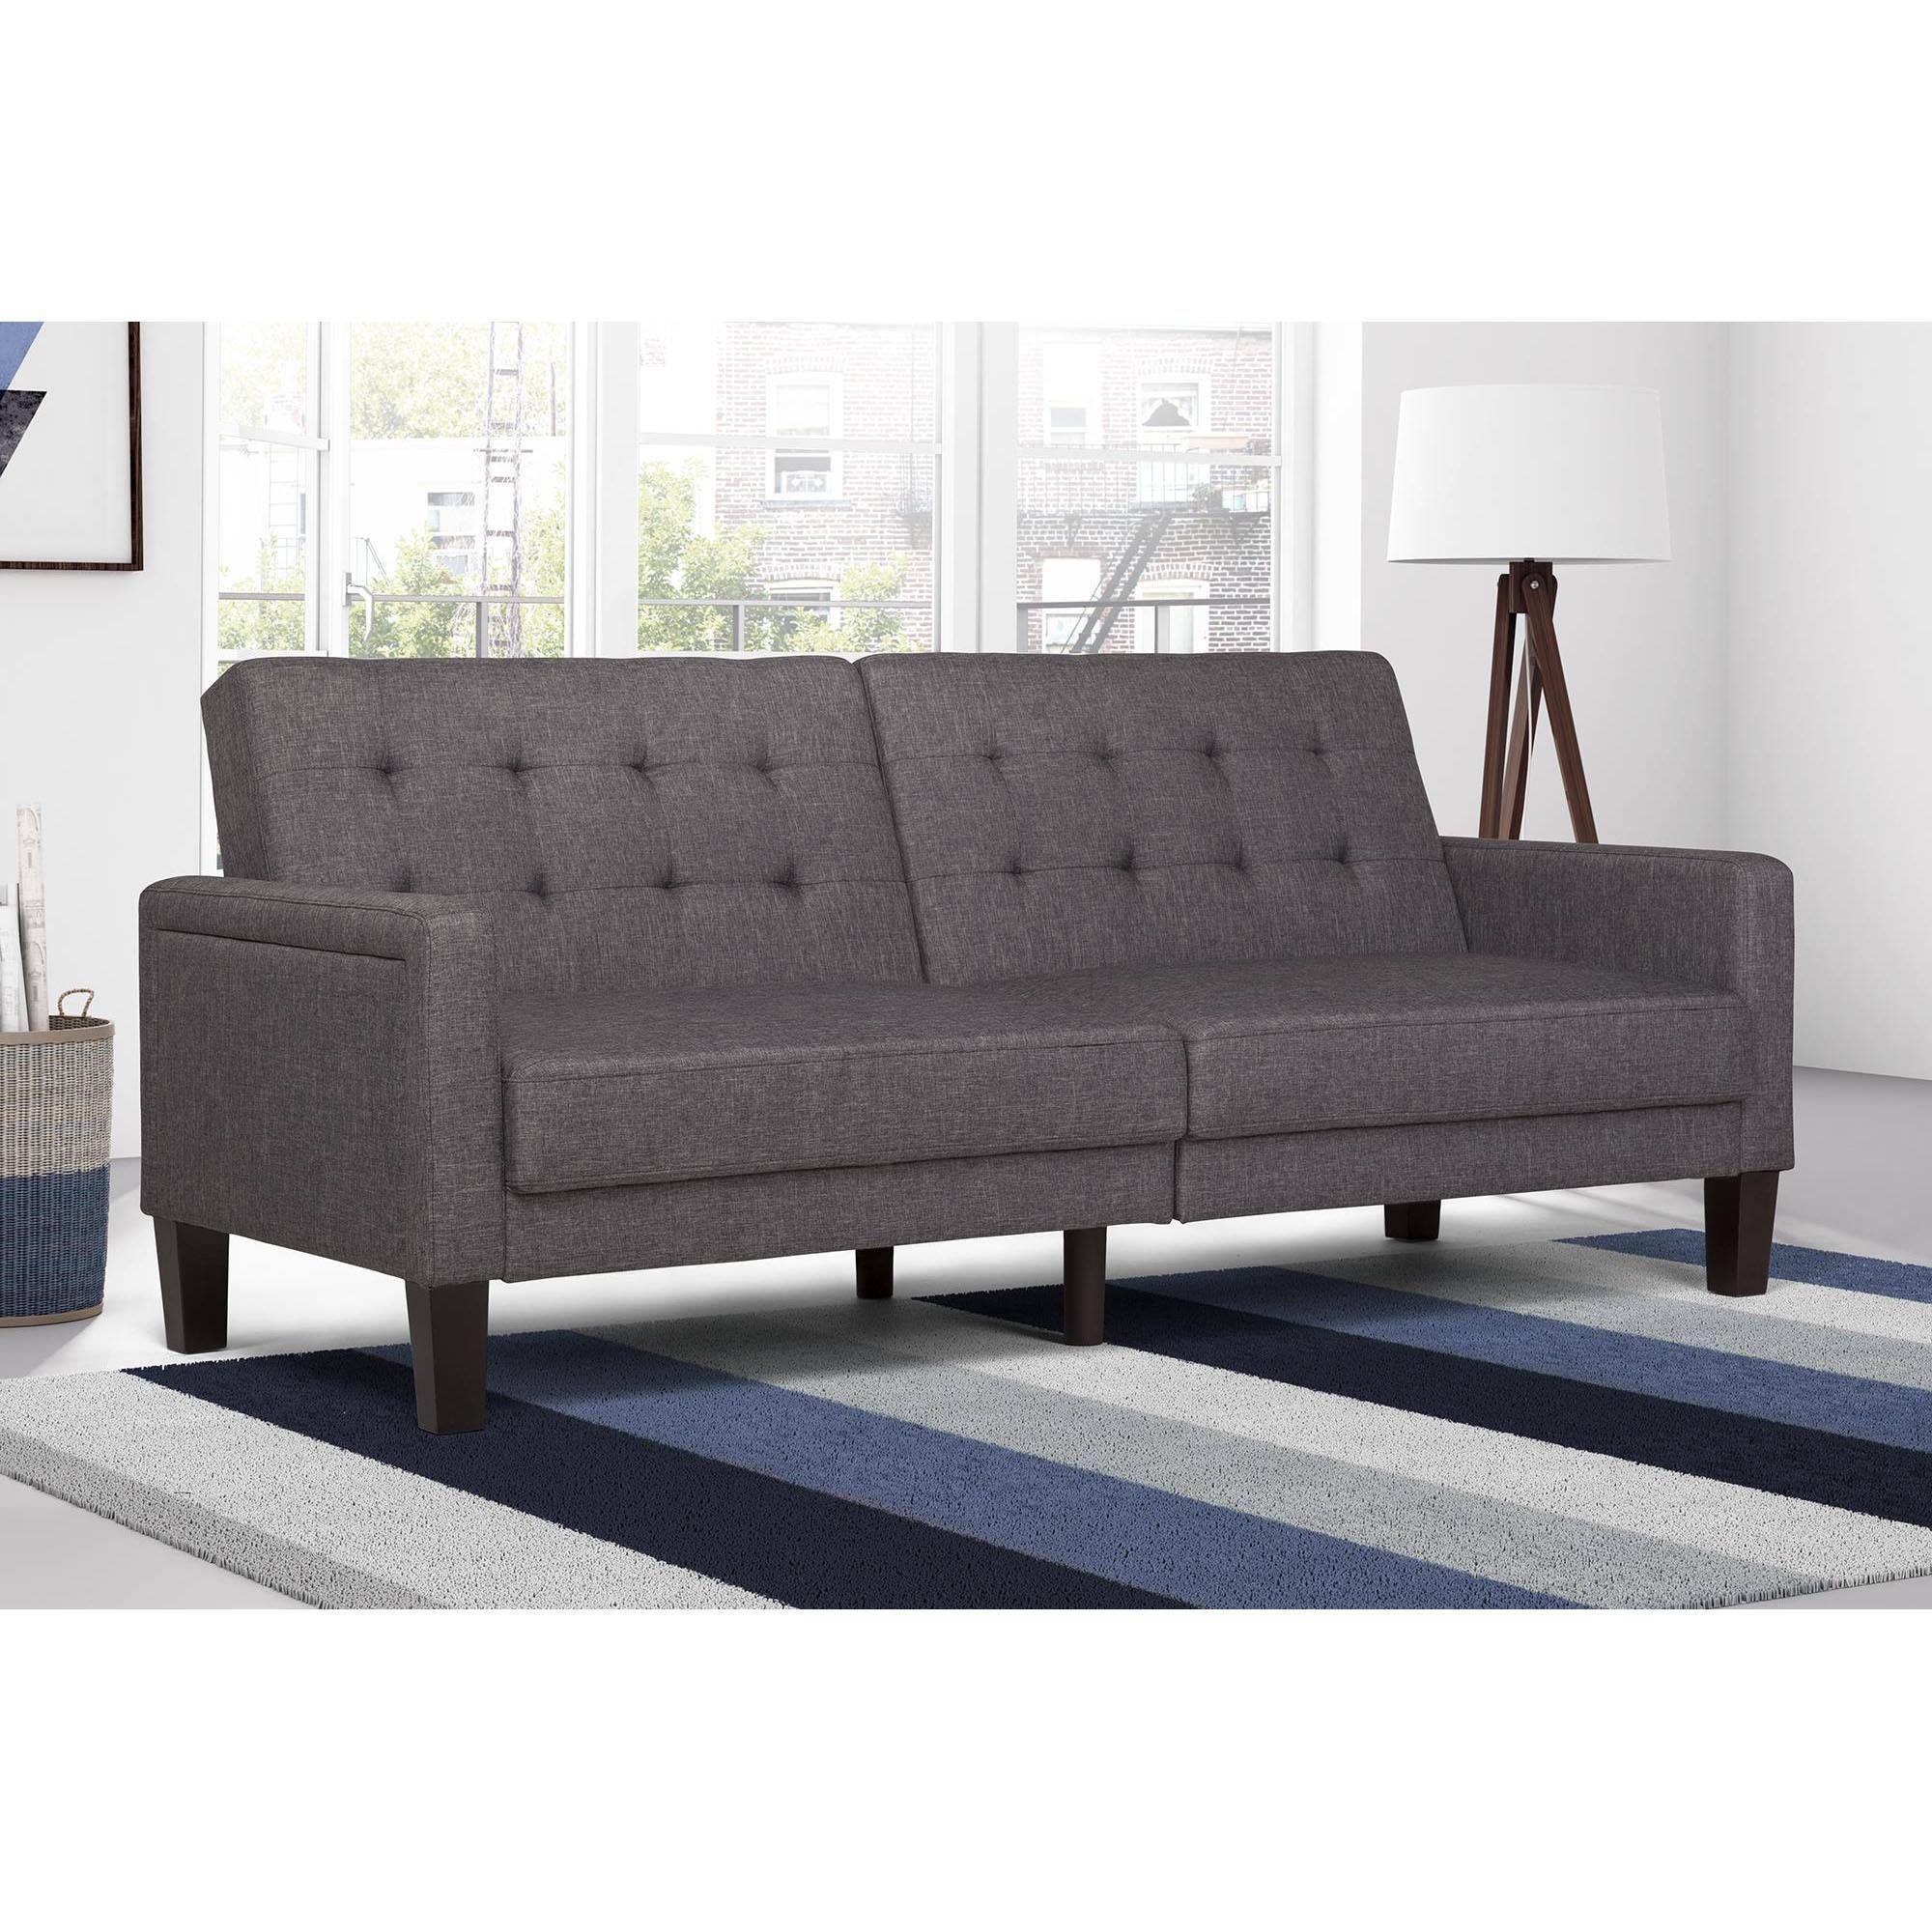 Better Homes Gardens Porter Fabric Tufted Sofa Bed Multiple Colors Walmart Com Futon Living Room Futon Sofa Futon